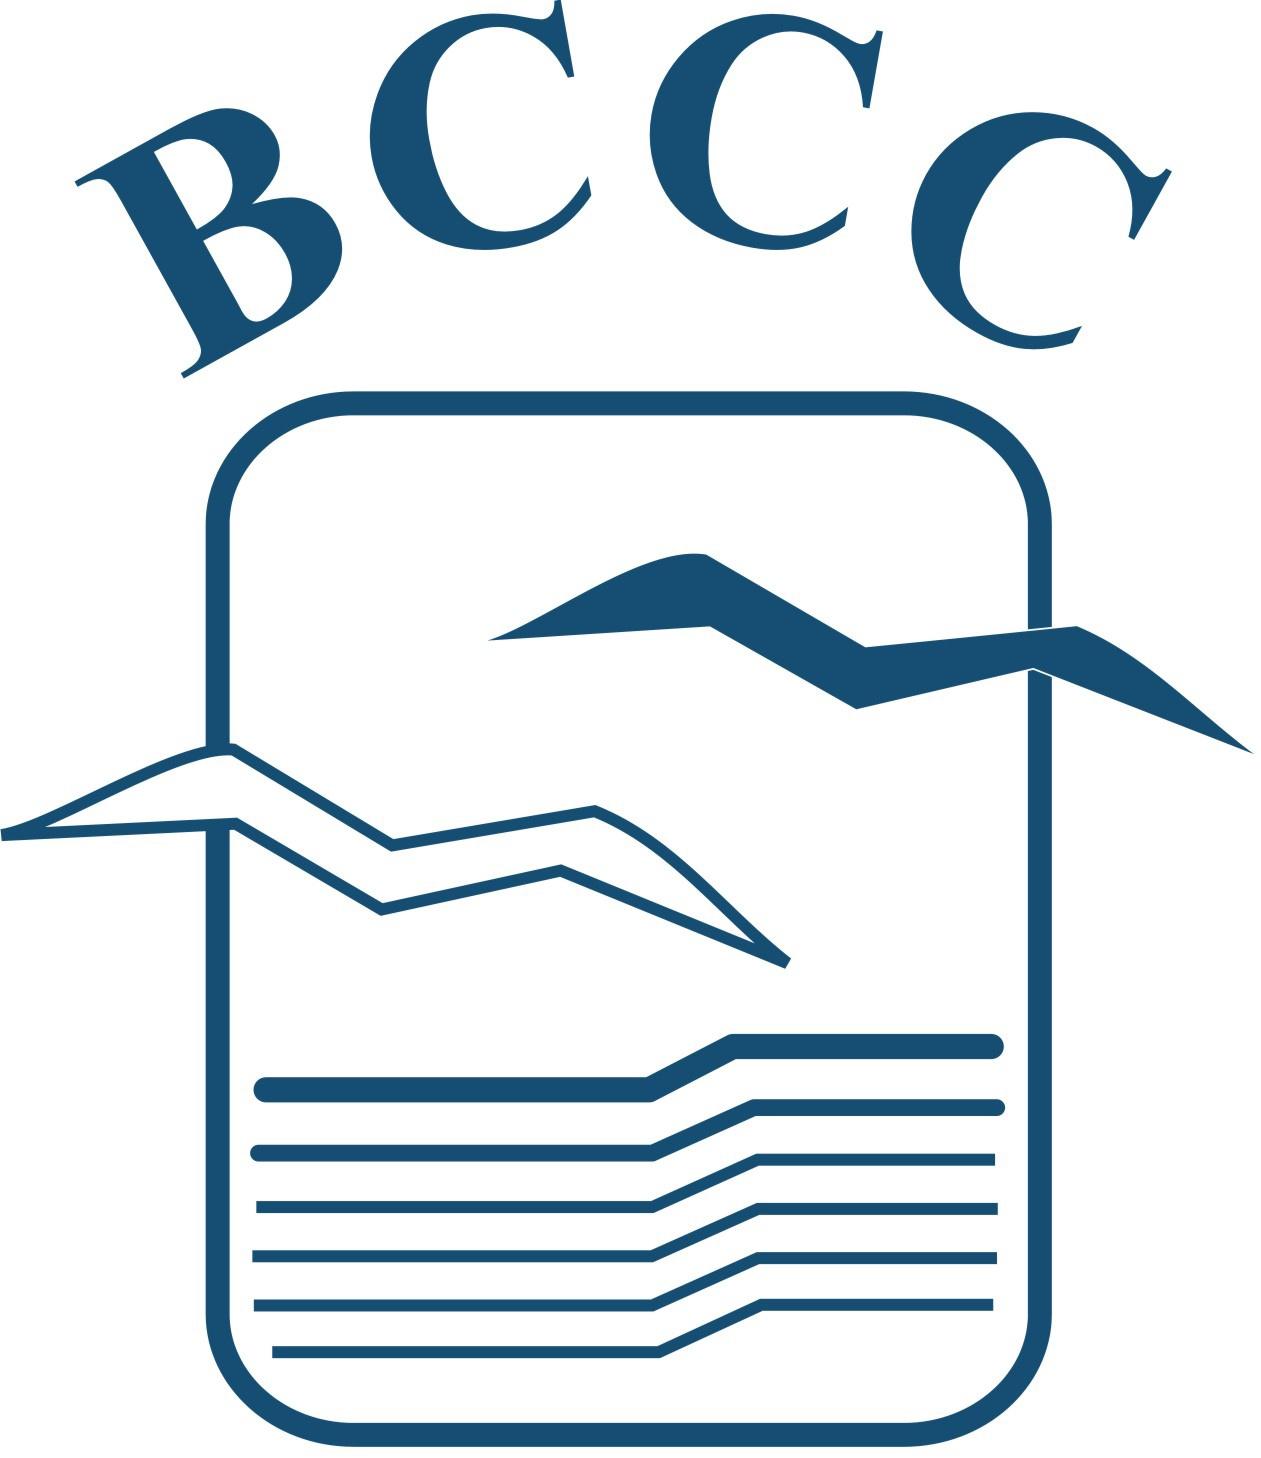 Beaufort County Community College Akademos